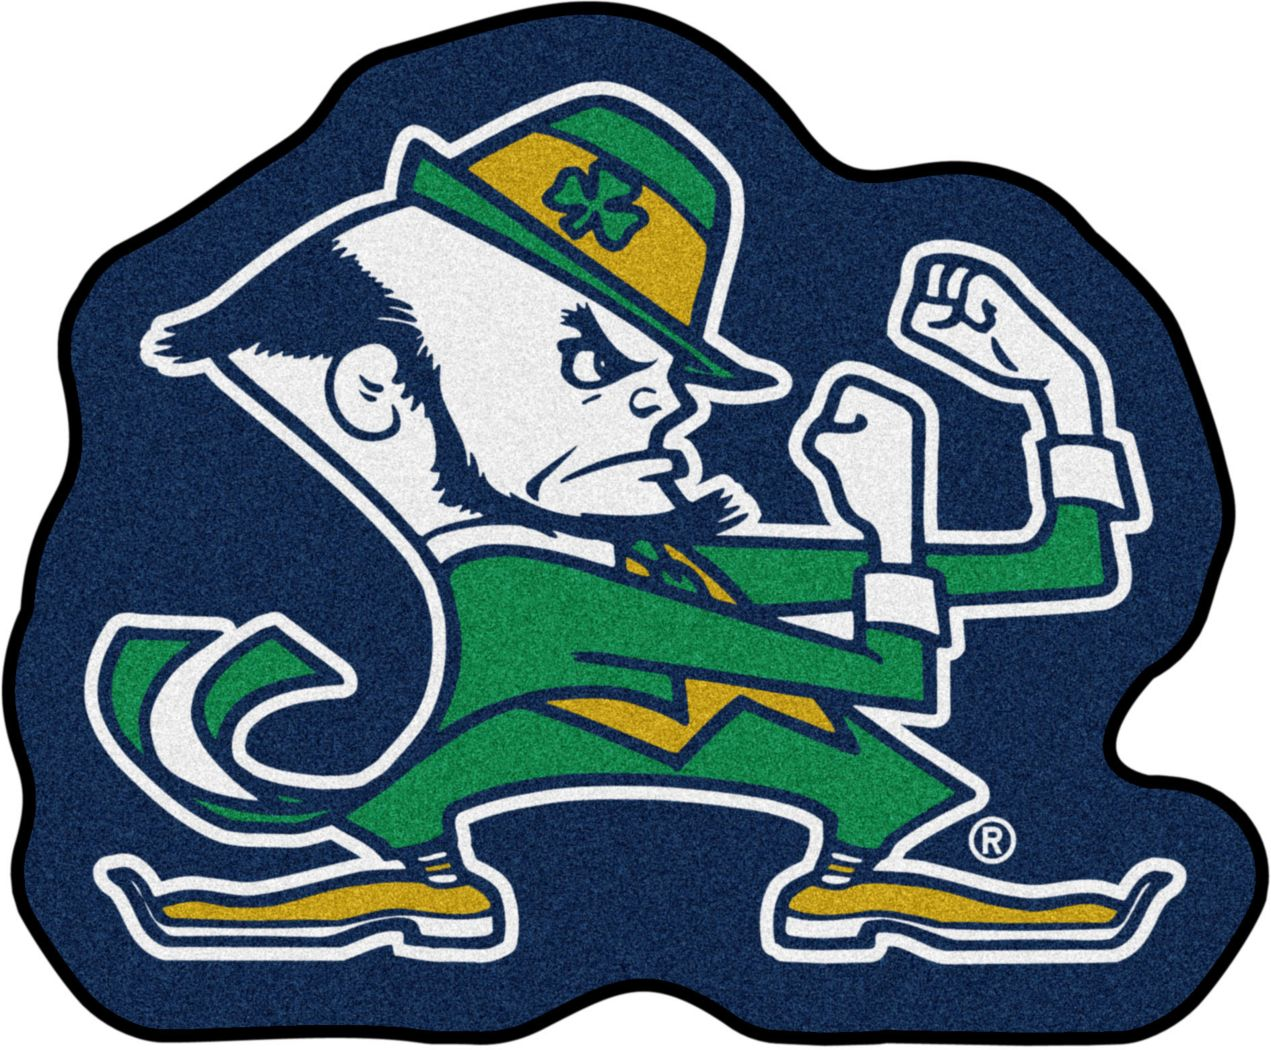 "NCAA Football Mascot Notre Dame 1'6"" x 2' Rug"